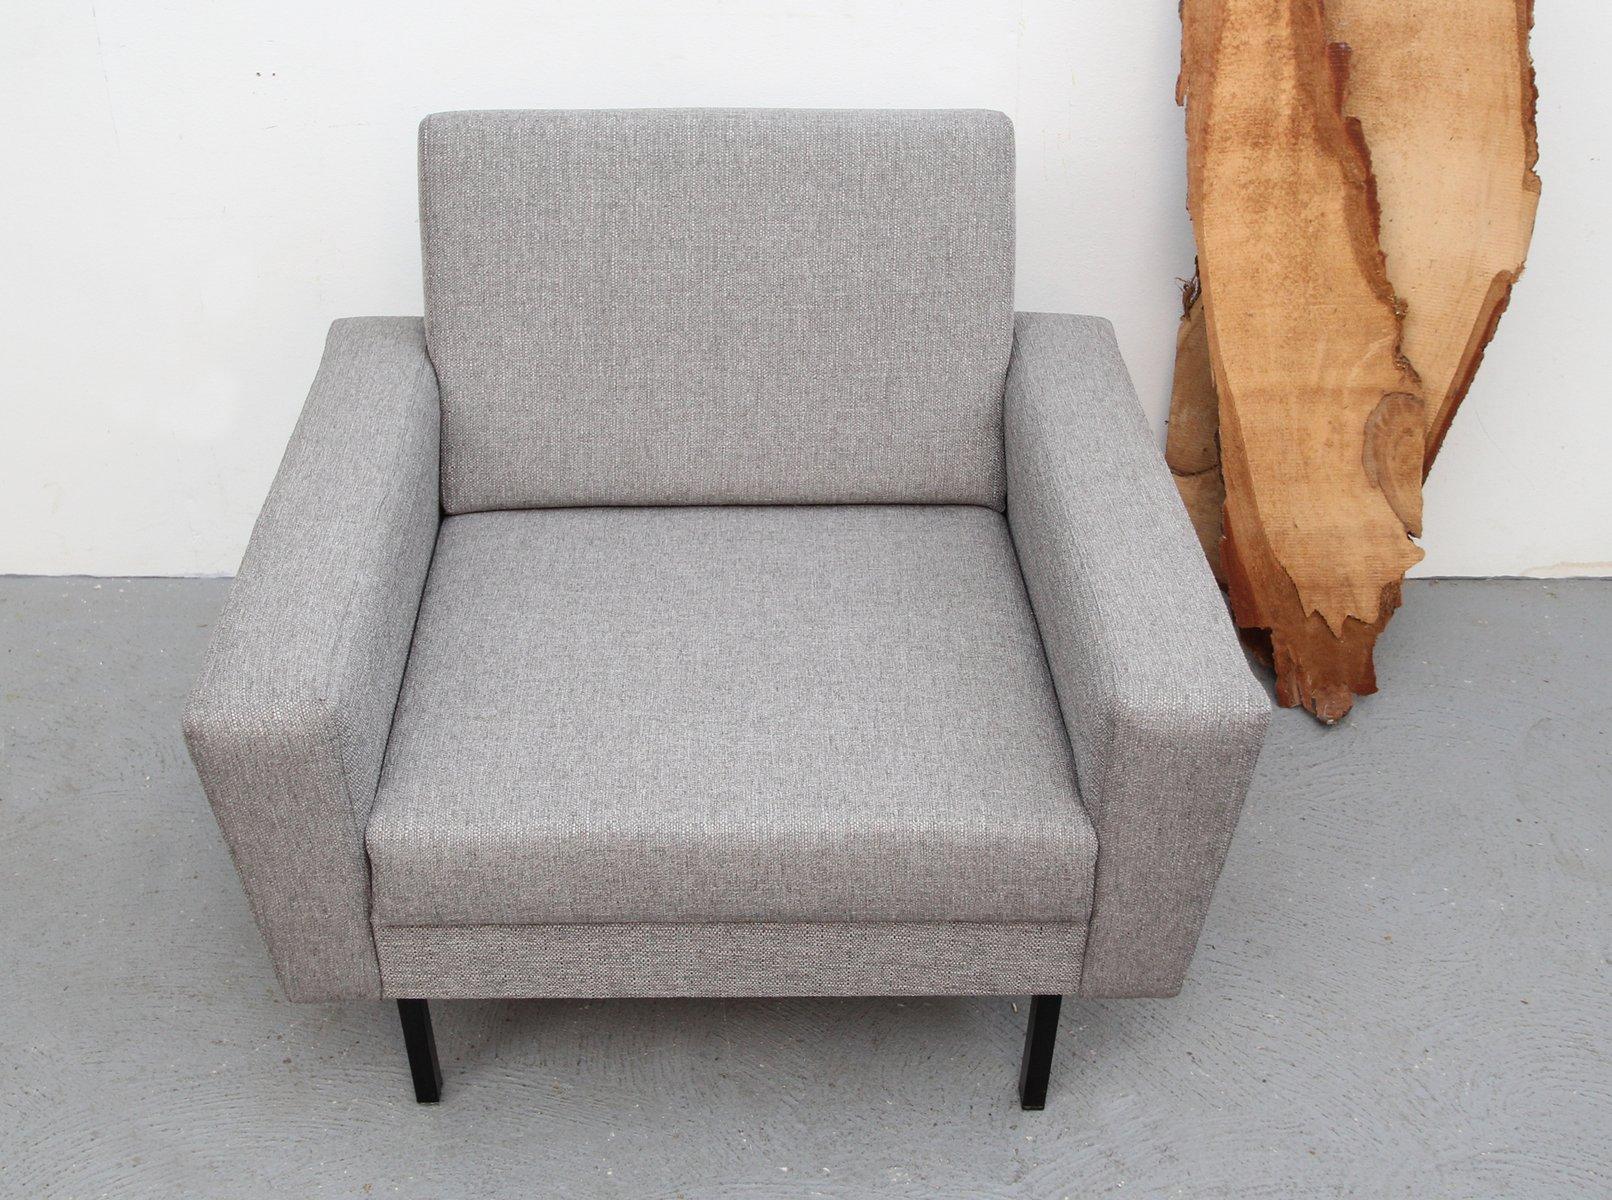 grauer w rfelf rmiger sessel bei pamono kaufen. Black Bedroom Furniture Sets. Home Design Ideas